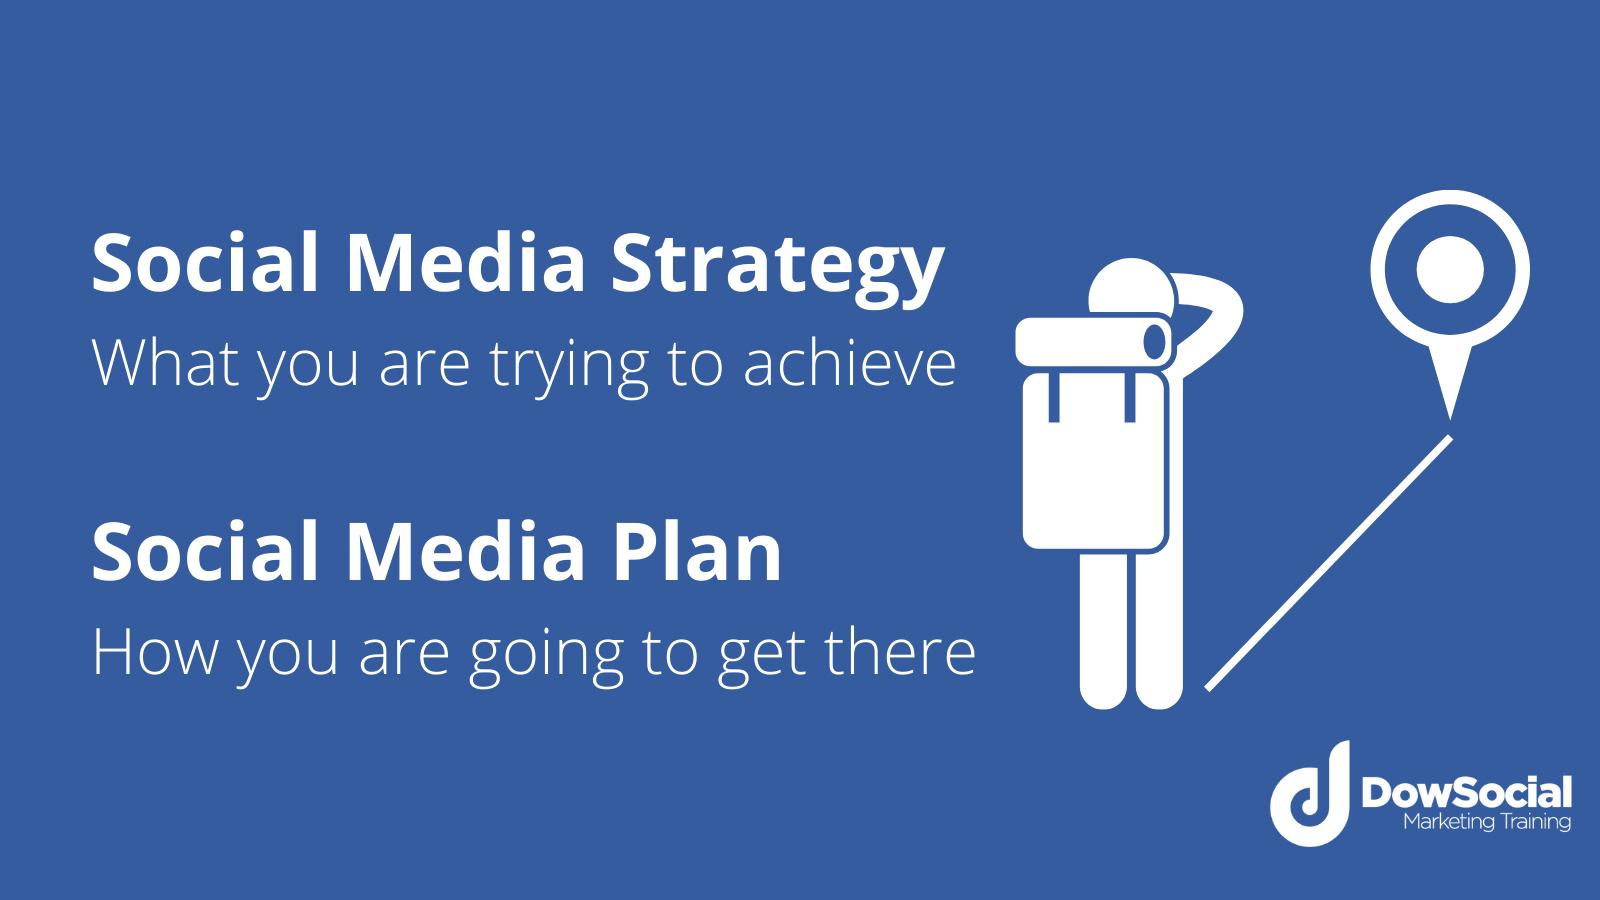 Picture defining social media strategy vs a social media plan